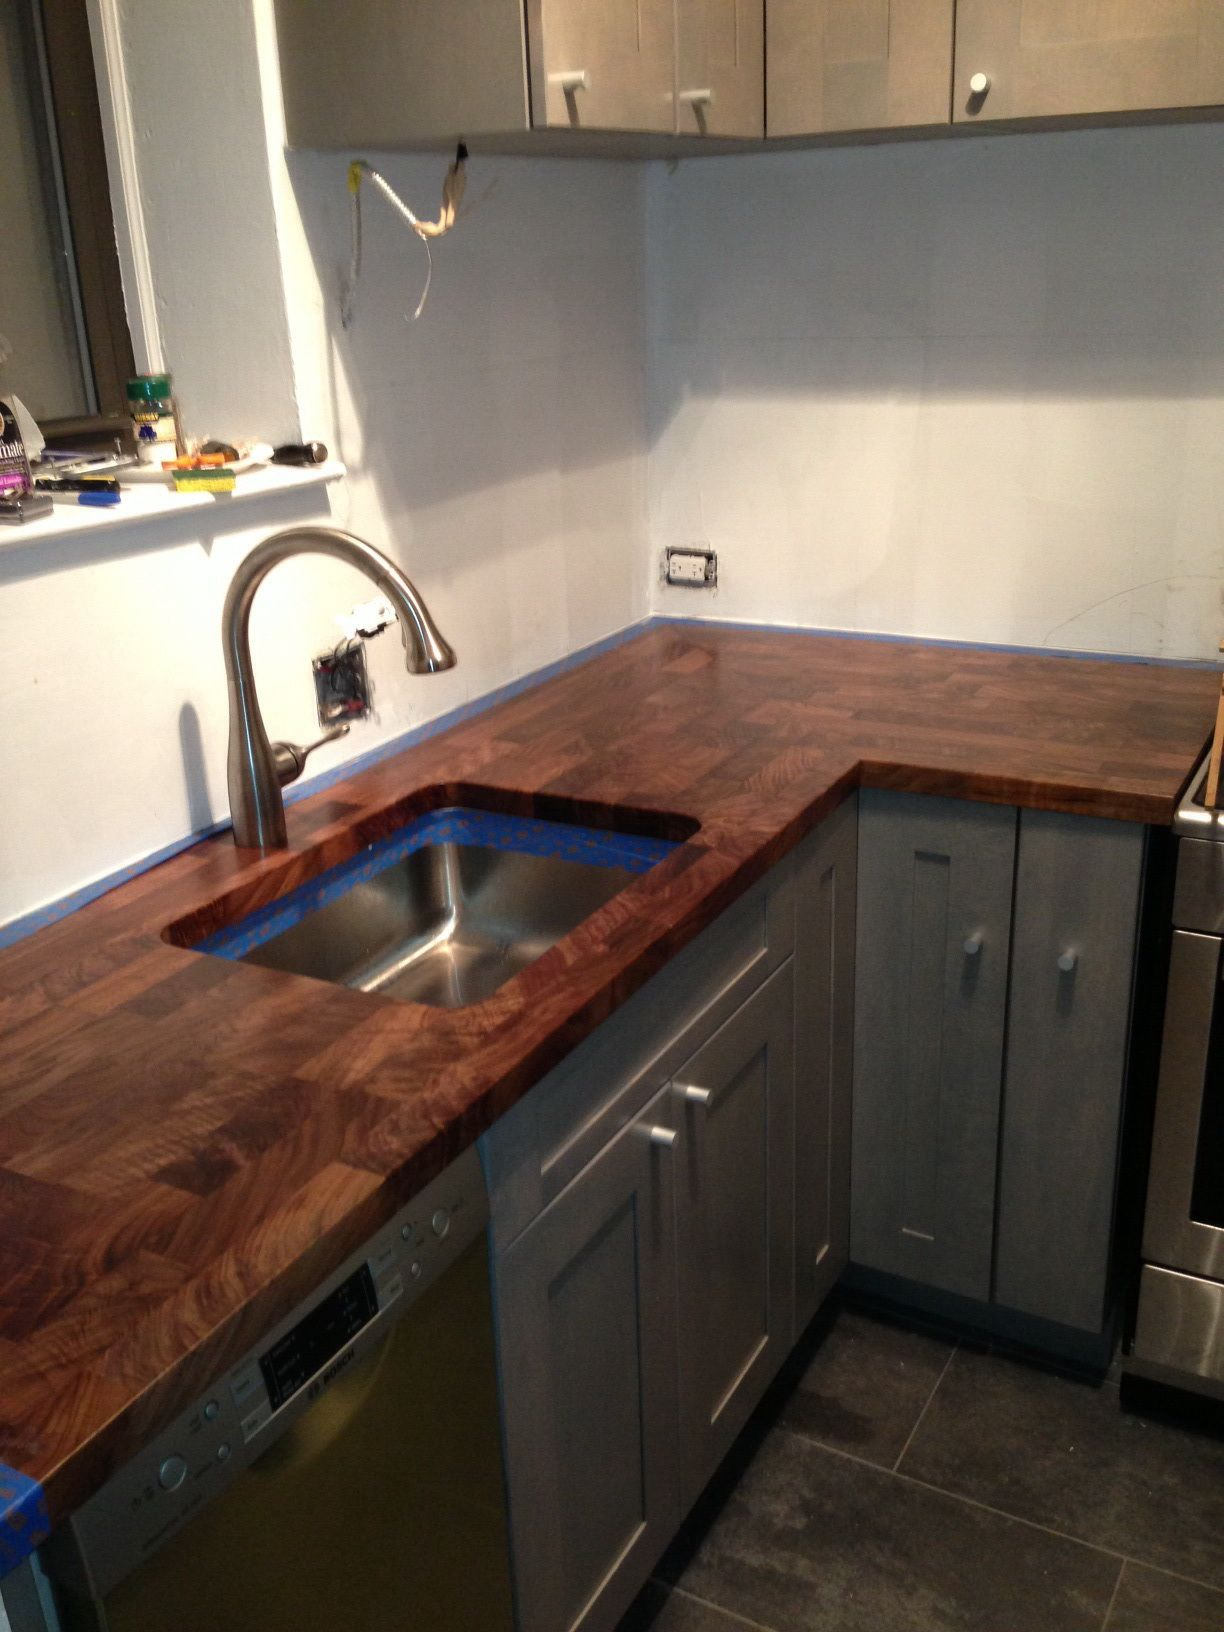 how to cut quartz countertop for